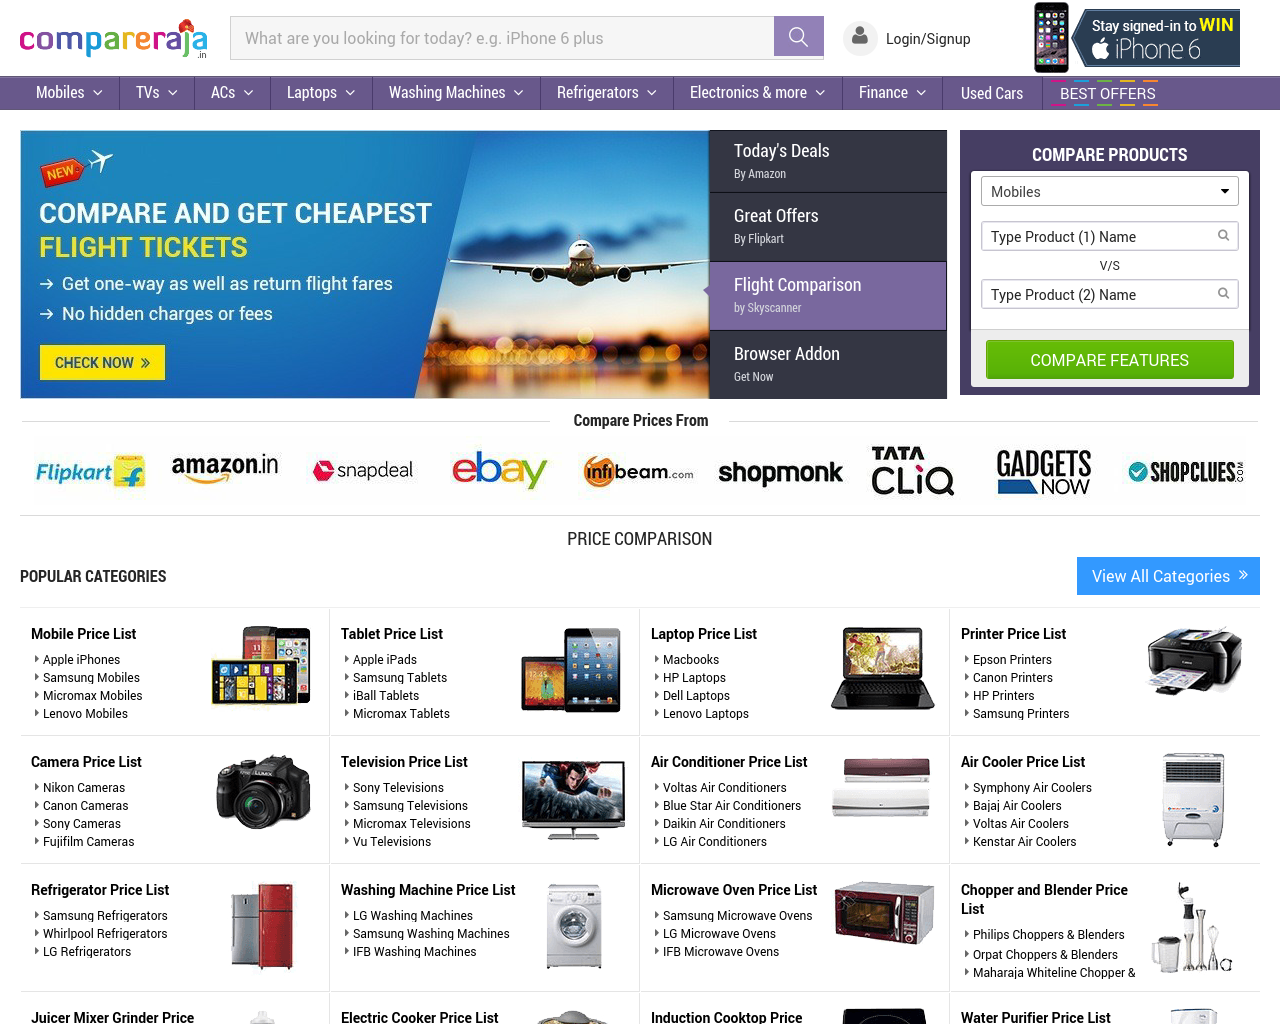 Compareraja-Advertising-Reviews-Pricing